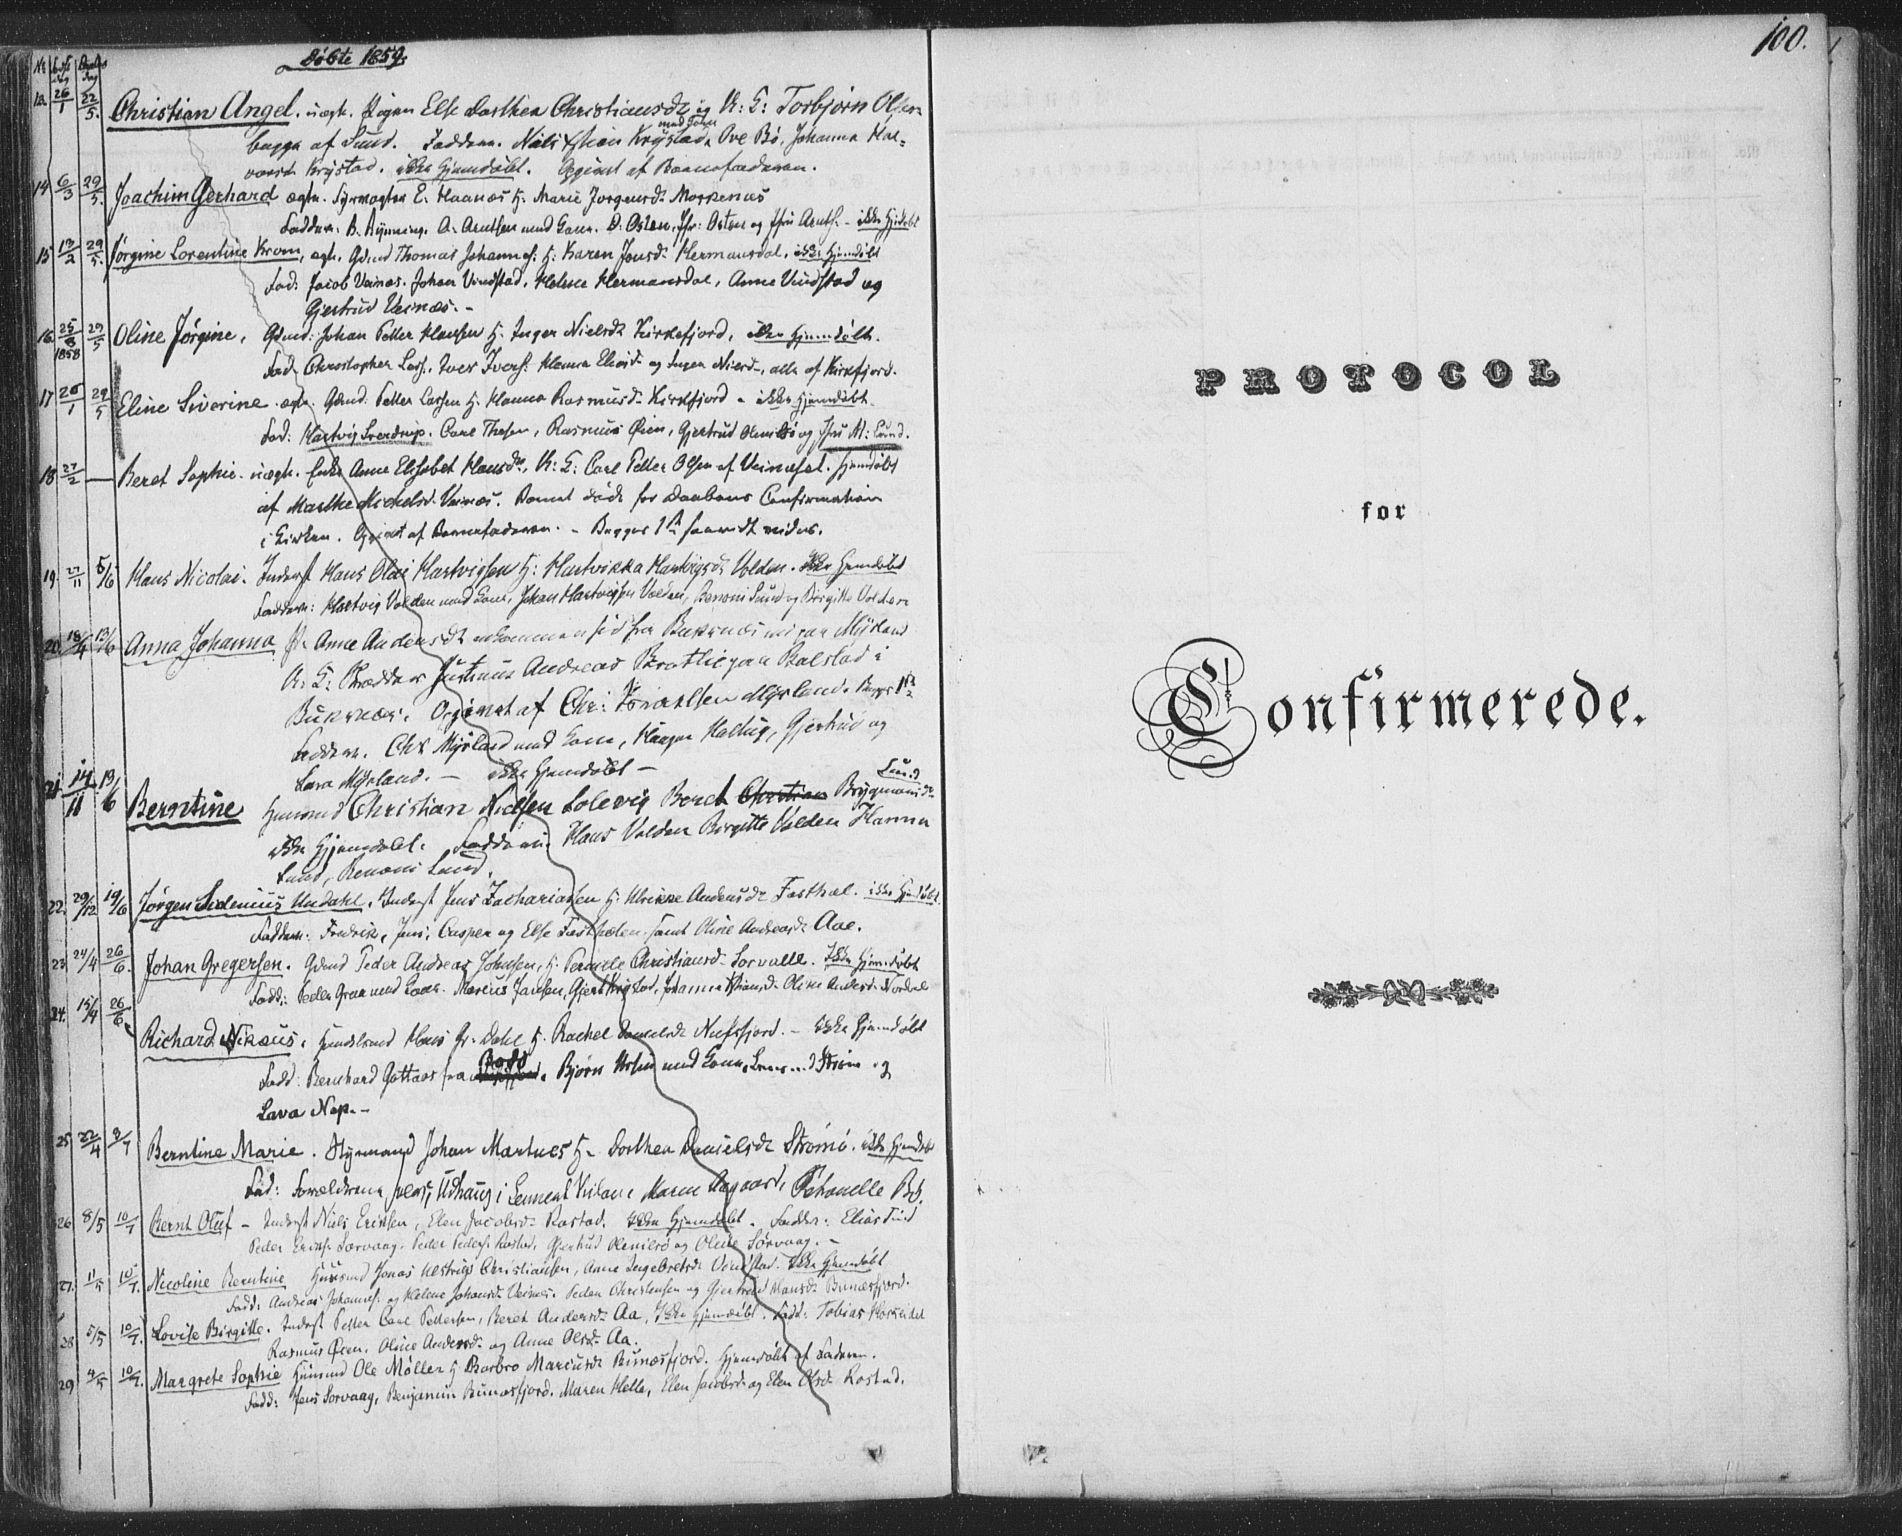 SAT, Ministerialprotokoller, klokkerbøker og fødselsregistre - Nordland, 885/L1202: Ministerialbok nr. 885A03, 1838-1859, s. 100